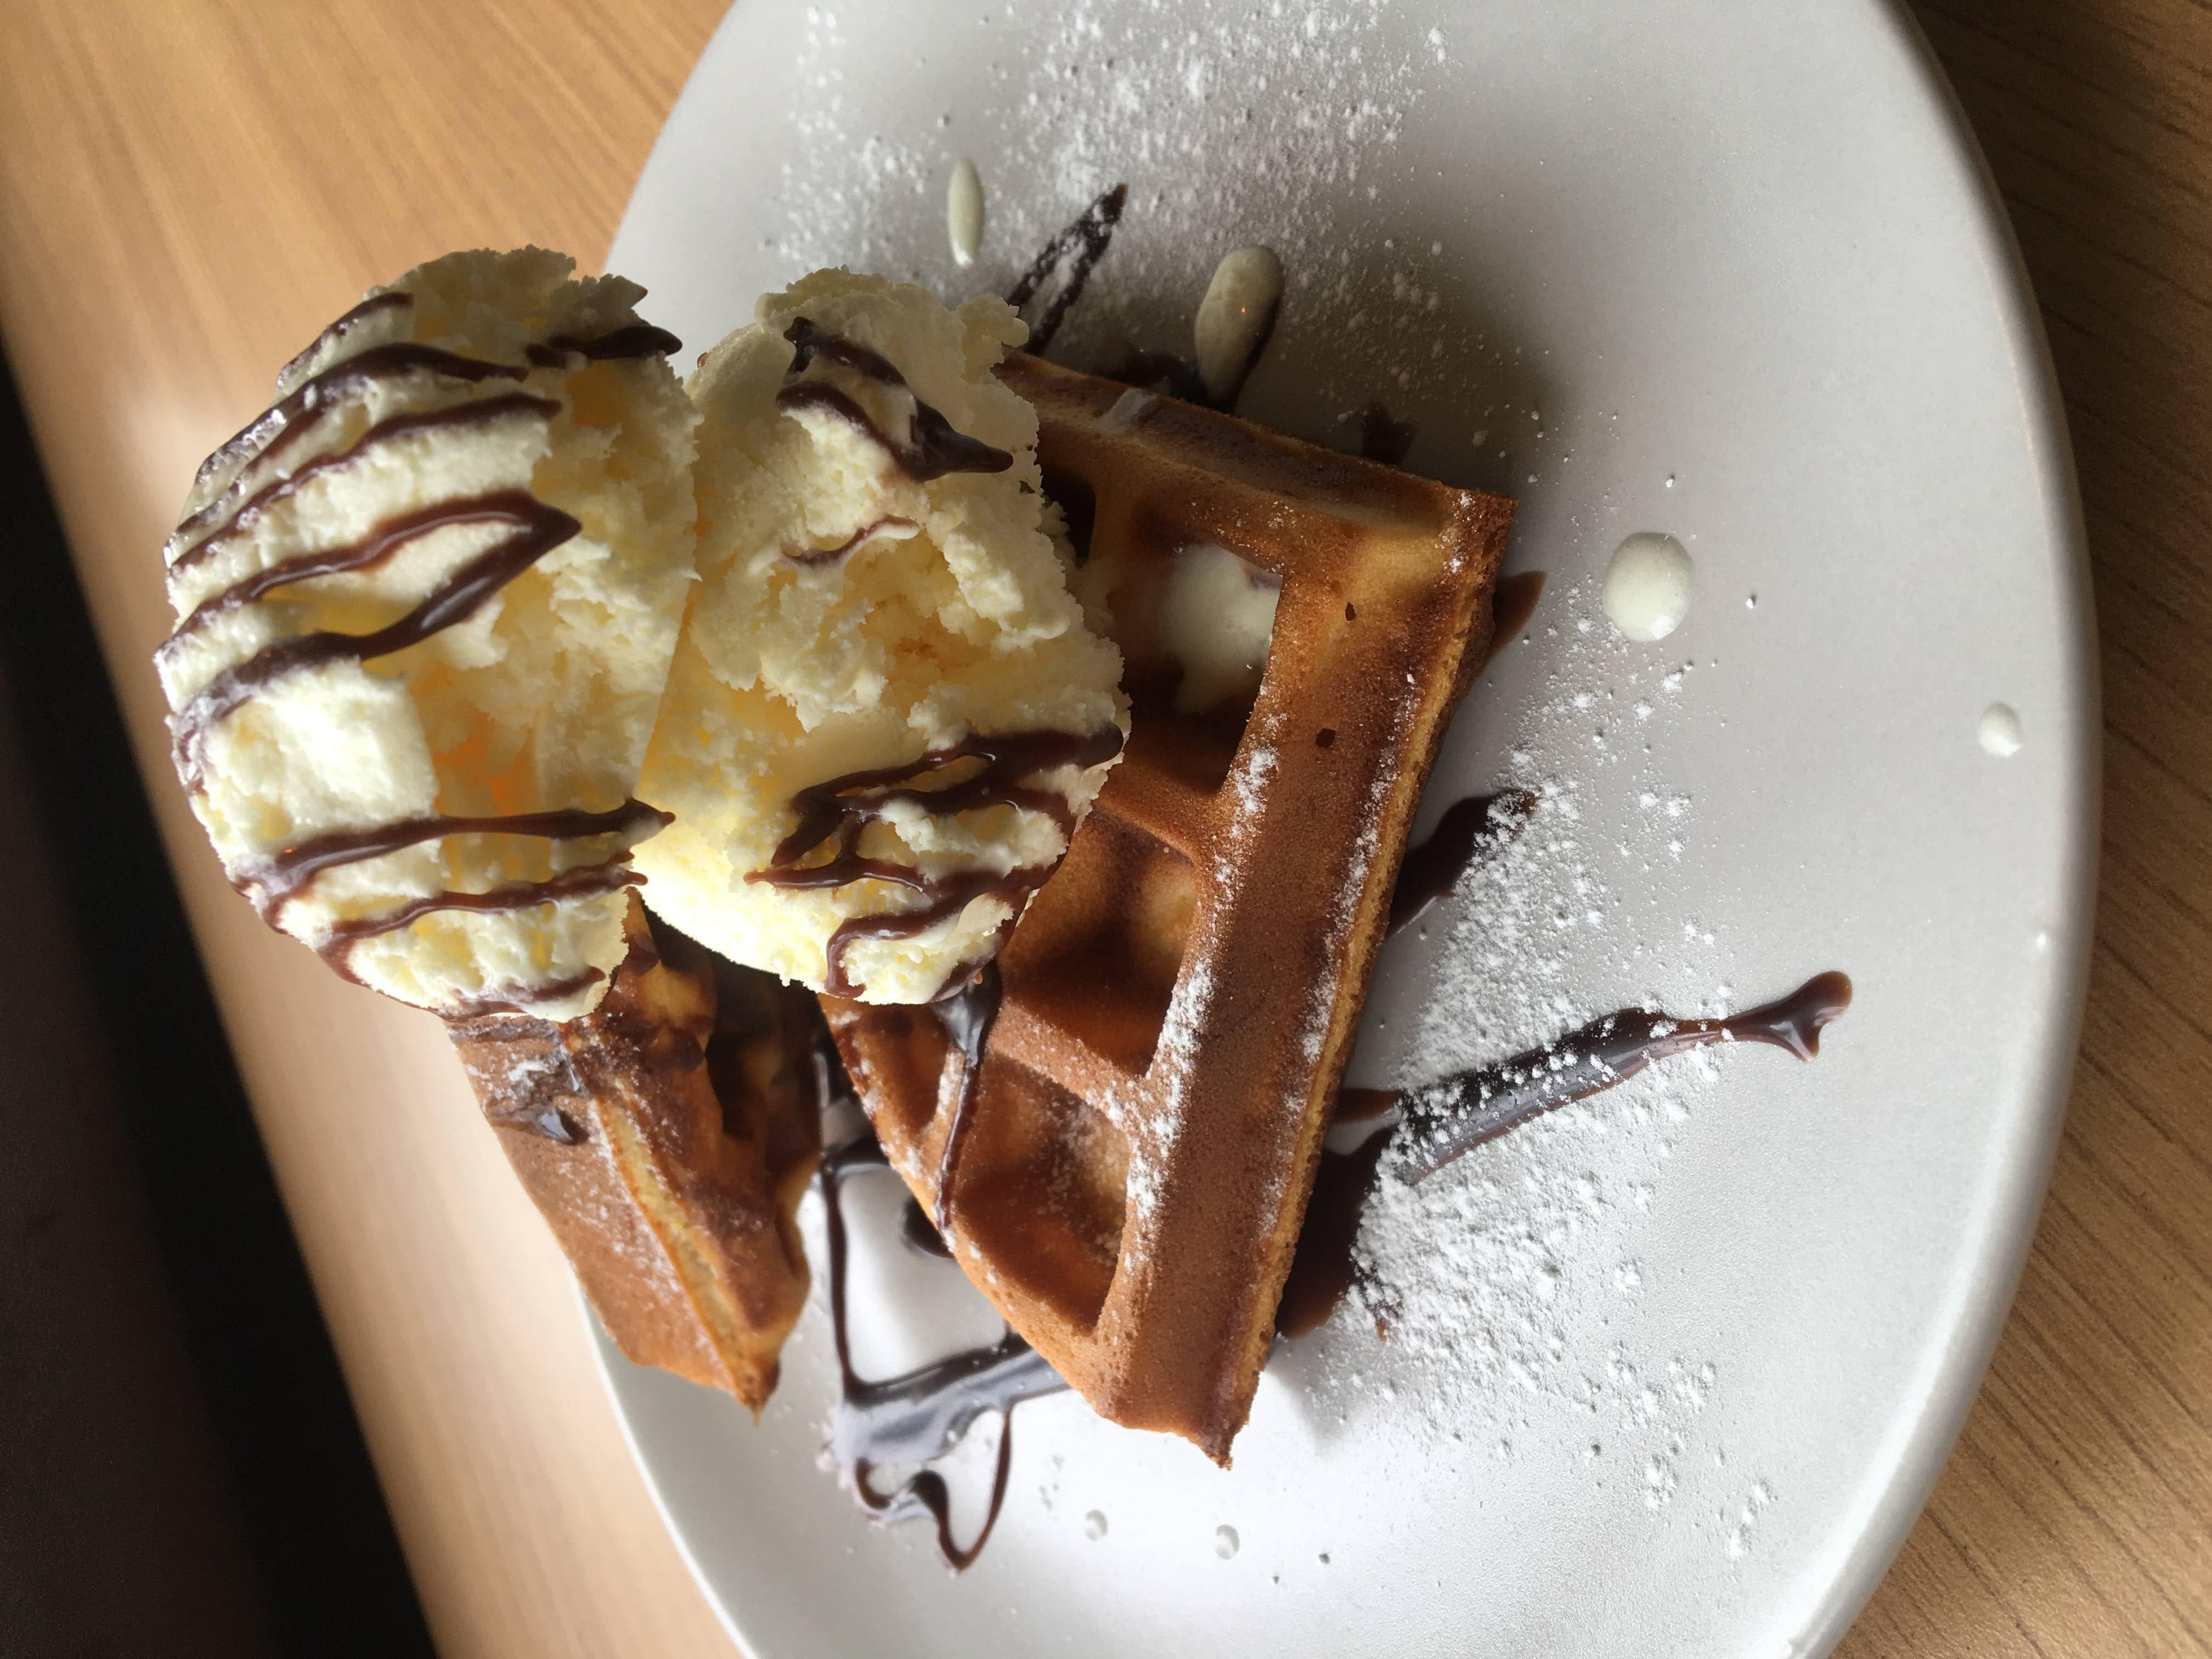 Waffle with Chocolate Sauce and Vanilla Ice Cream